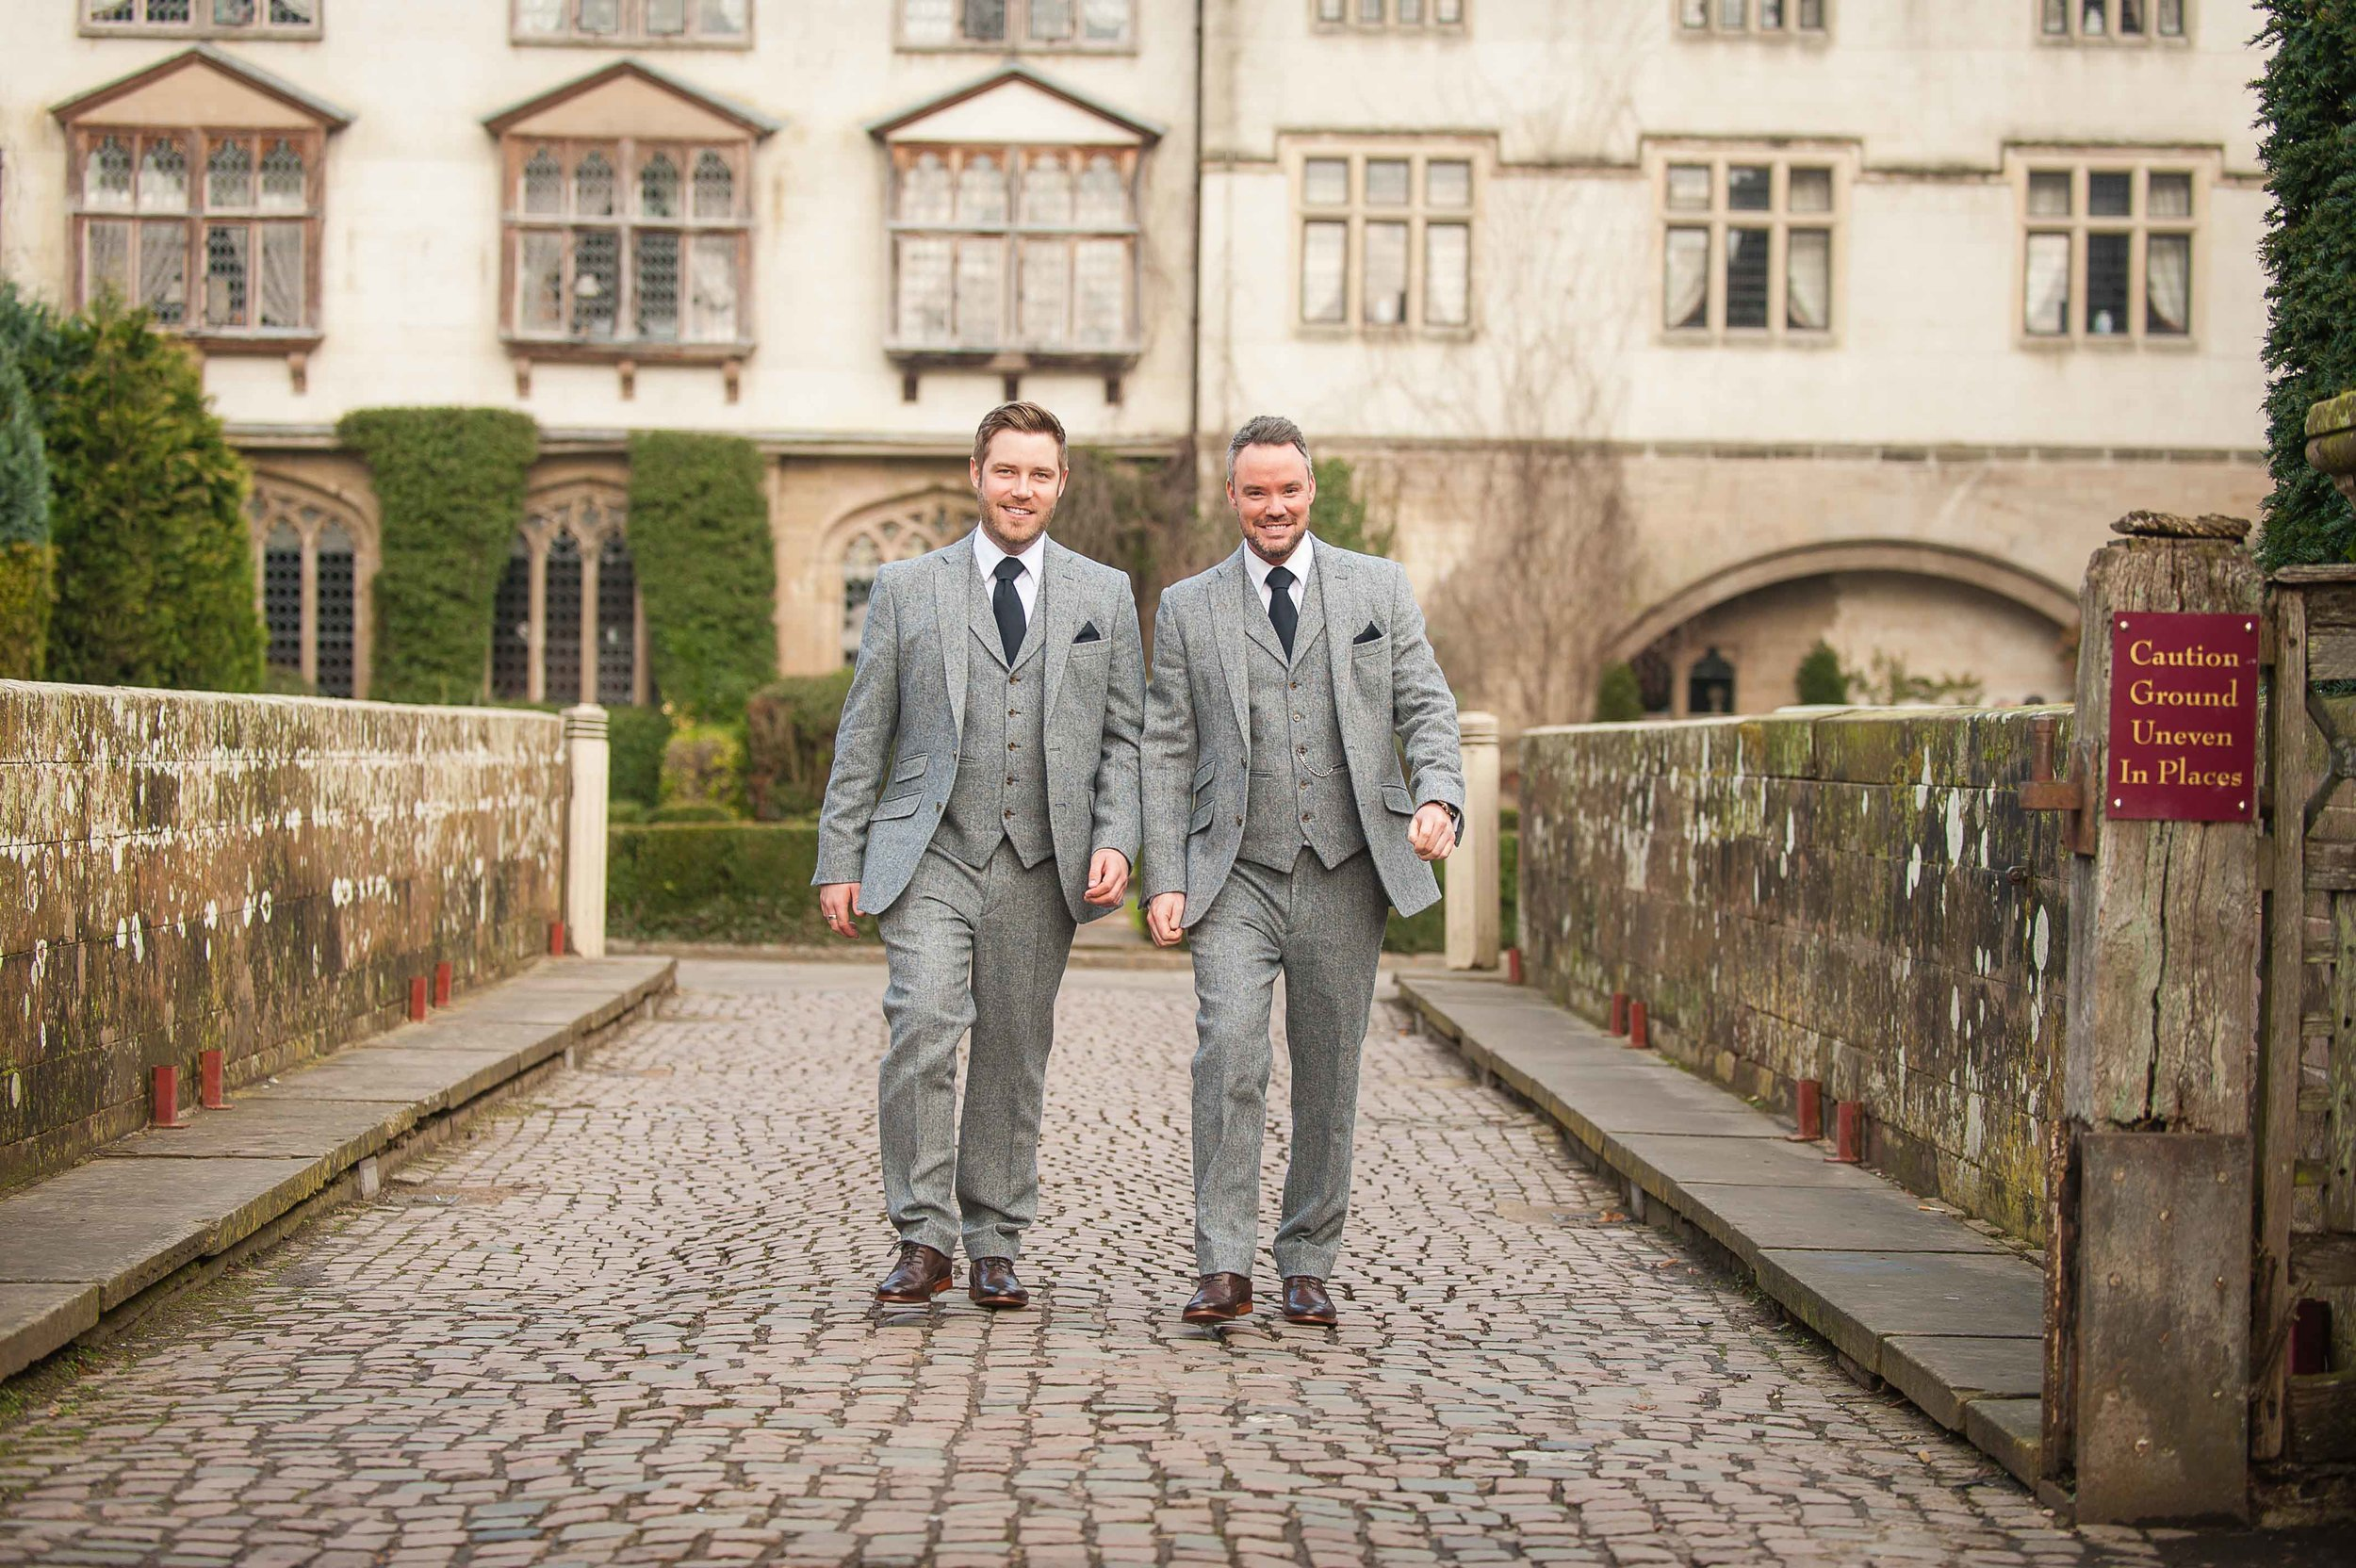 14.02.17 - Matt-Faye-Coombe-Abbey-Valentine-Wedding-Charnwood-Photography-1023.jpg